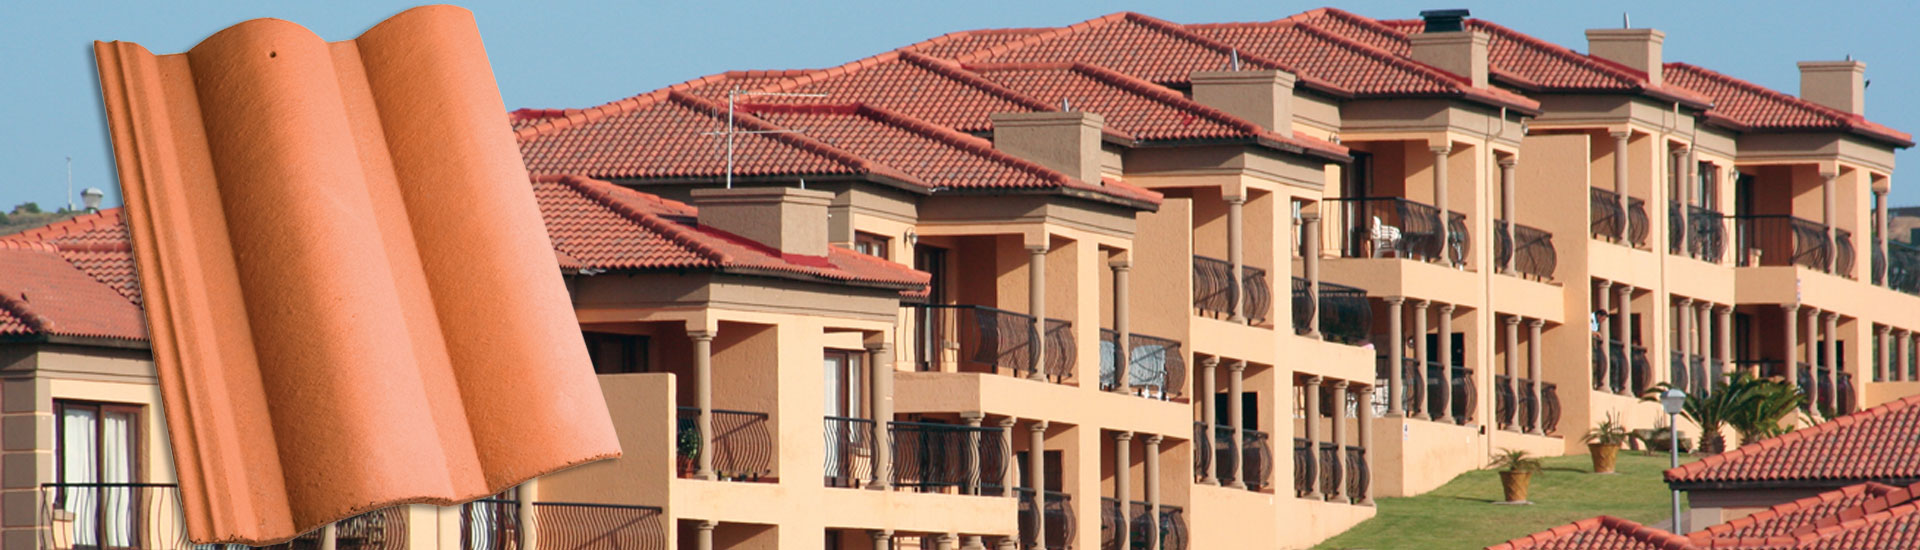 eagle roof tiles tuscan